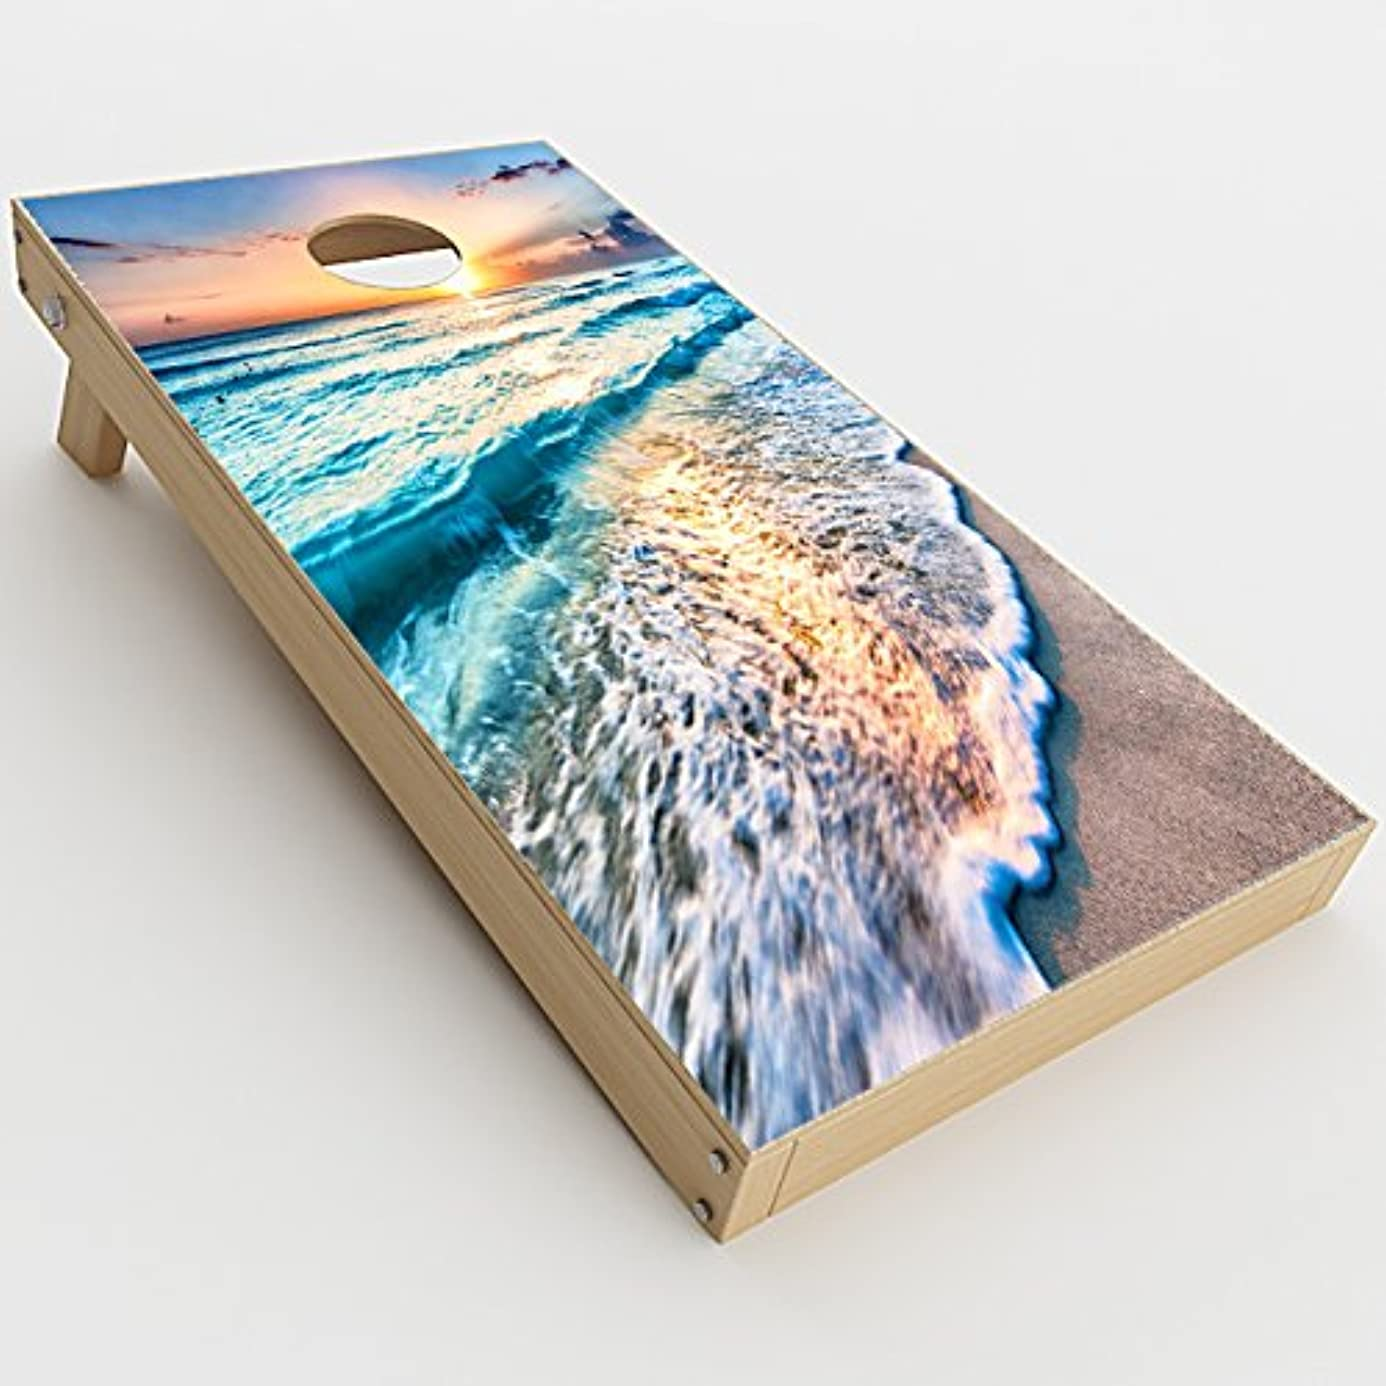 Skin Decals Vinyl Wrap for Cornhole Game Board Bag Toss (2xpcs.) / sunset on beach